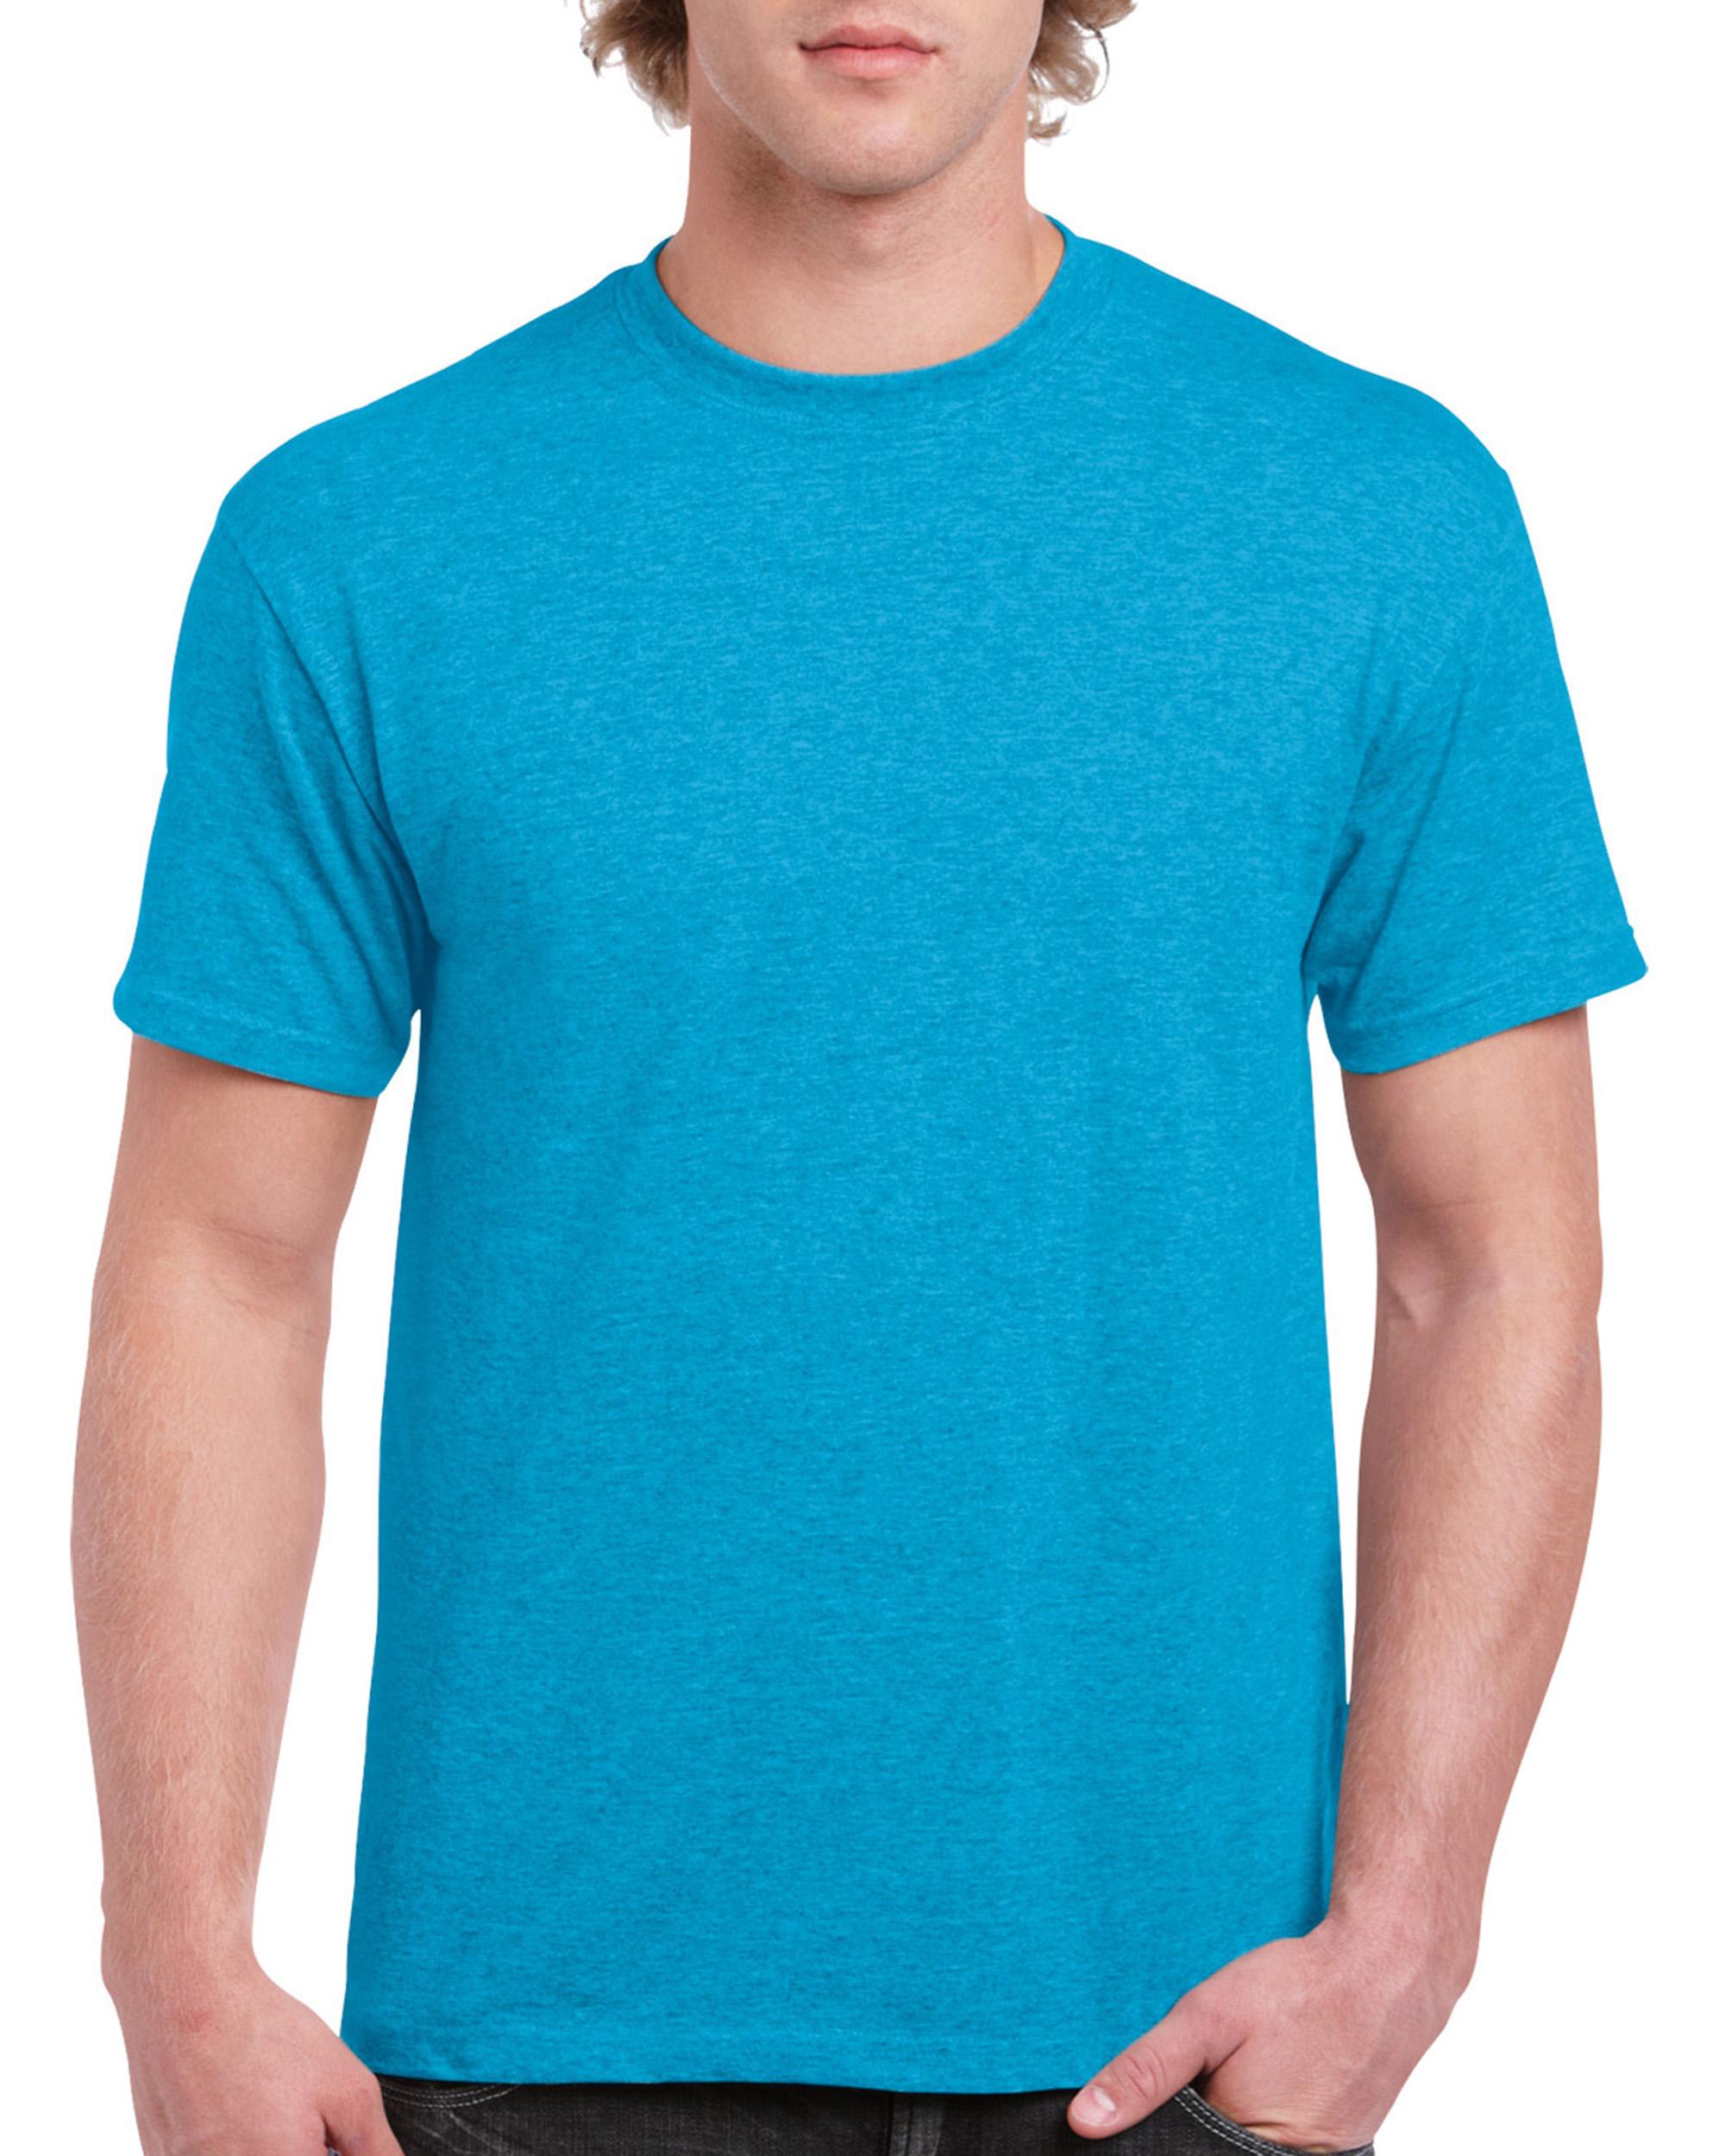 b93e9876 2000 Gildan Adult Ultra Cotton® 6 oz. T-Shirt